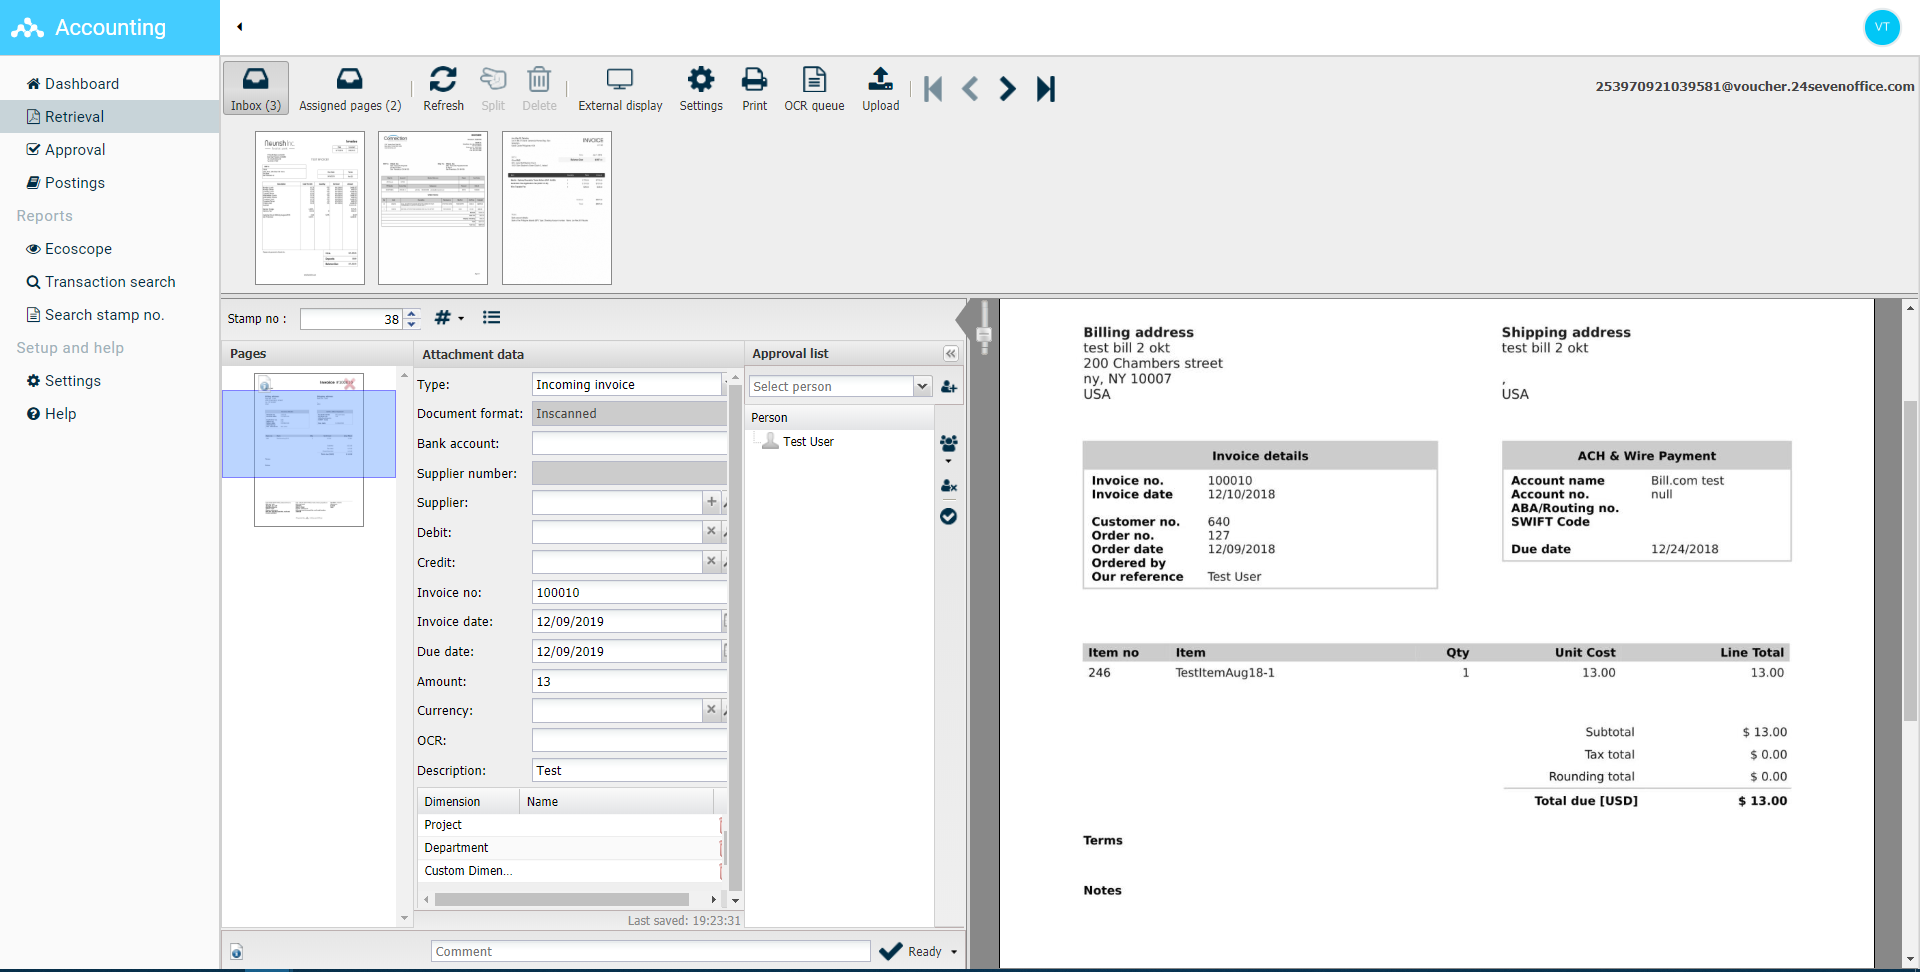 24SevenOffice Software - 5